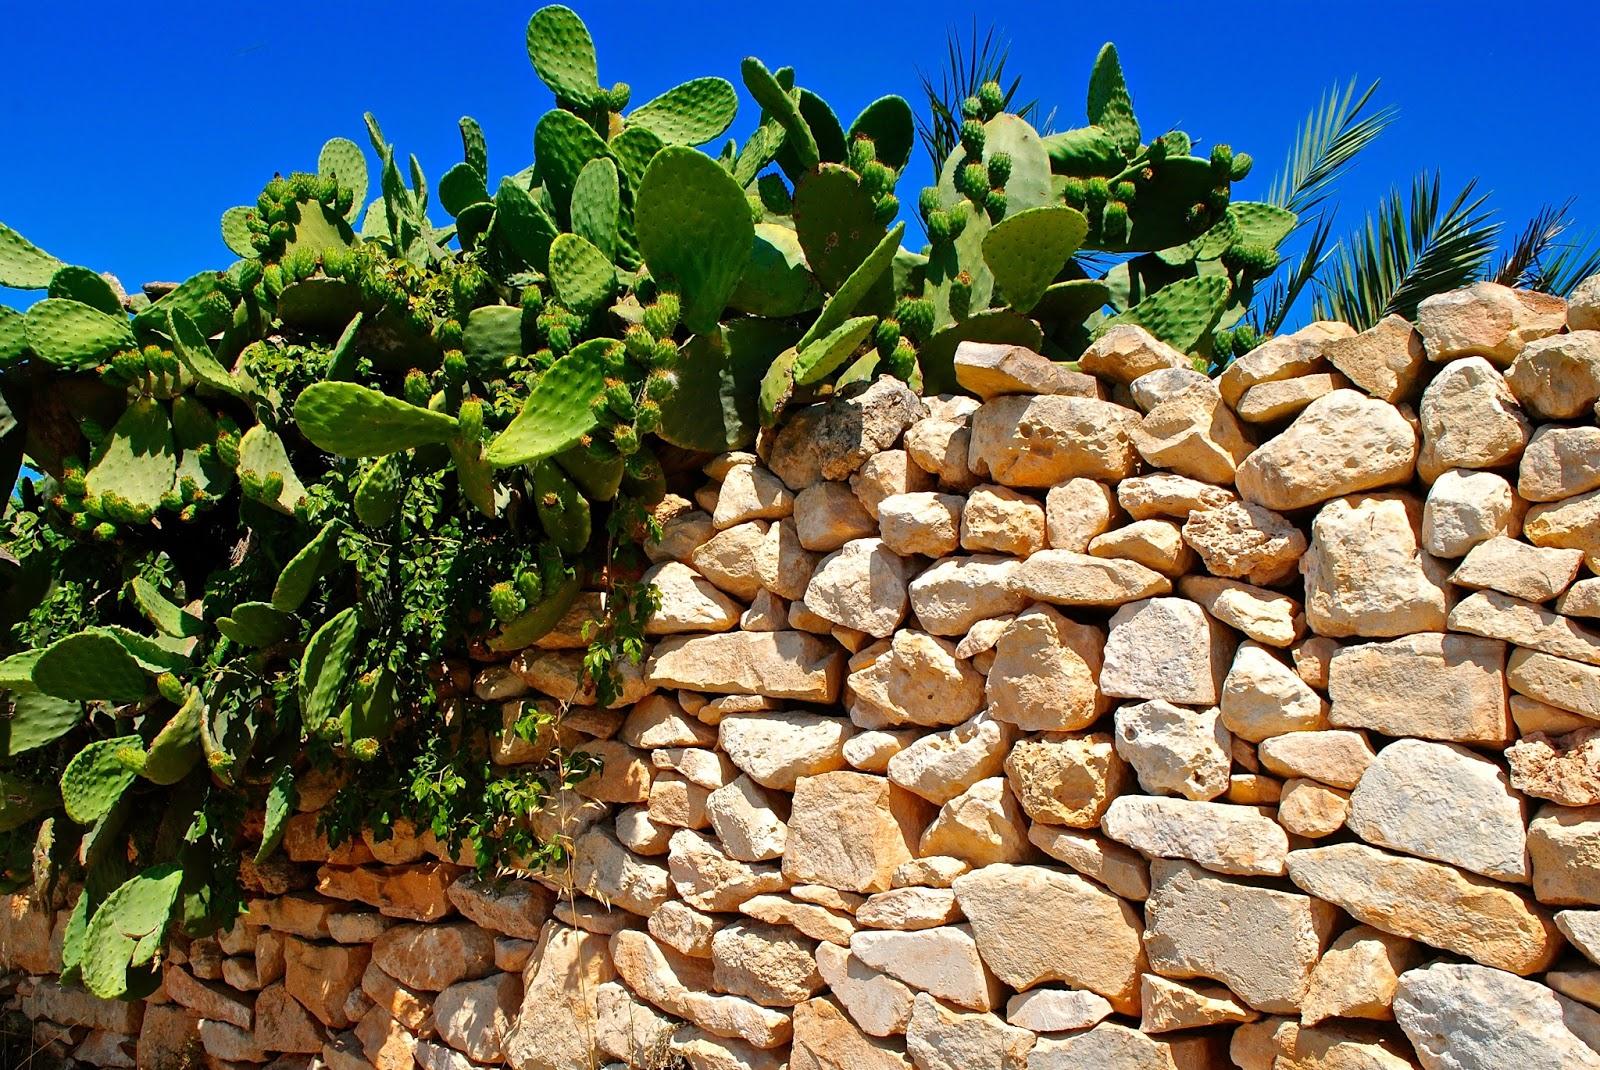 Prehistoric Megalithic Temples of Malta tour : Cacti at Mnajdra